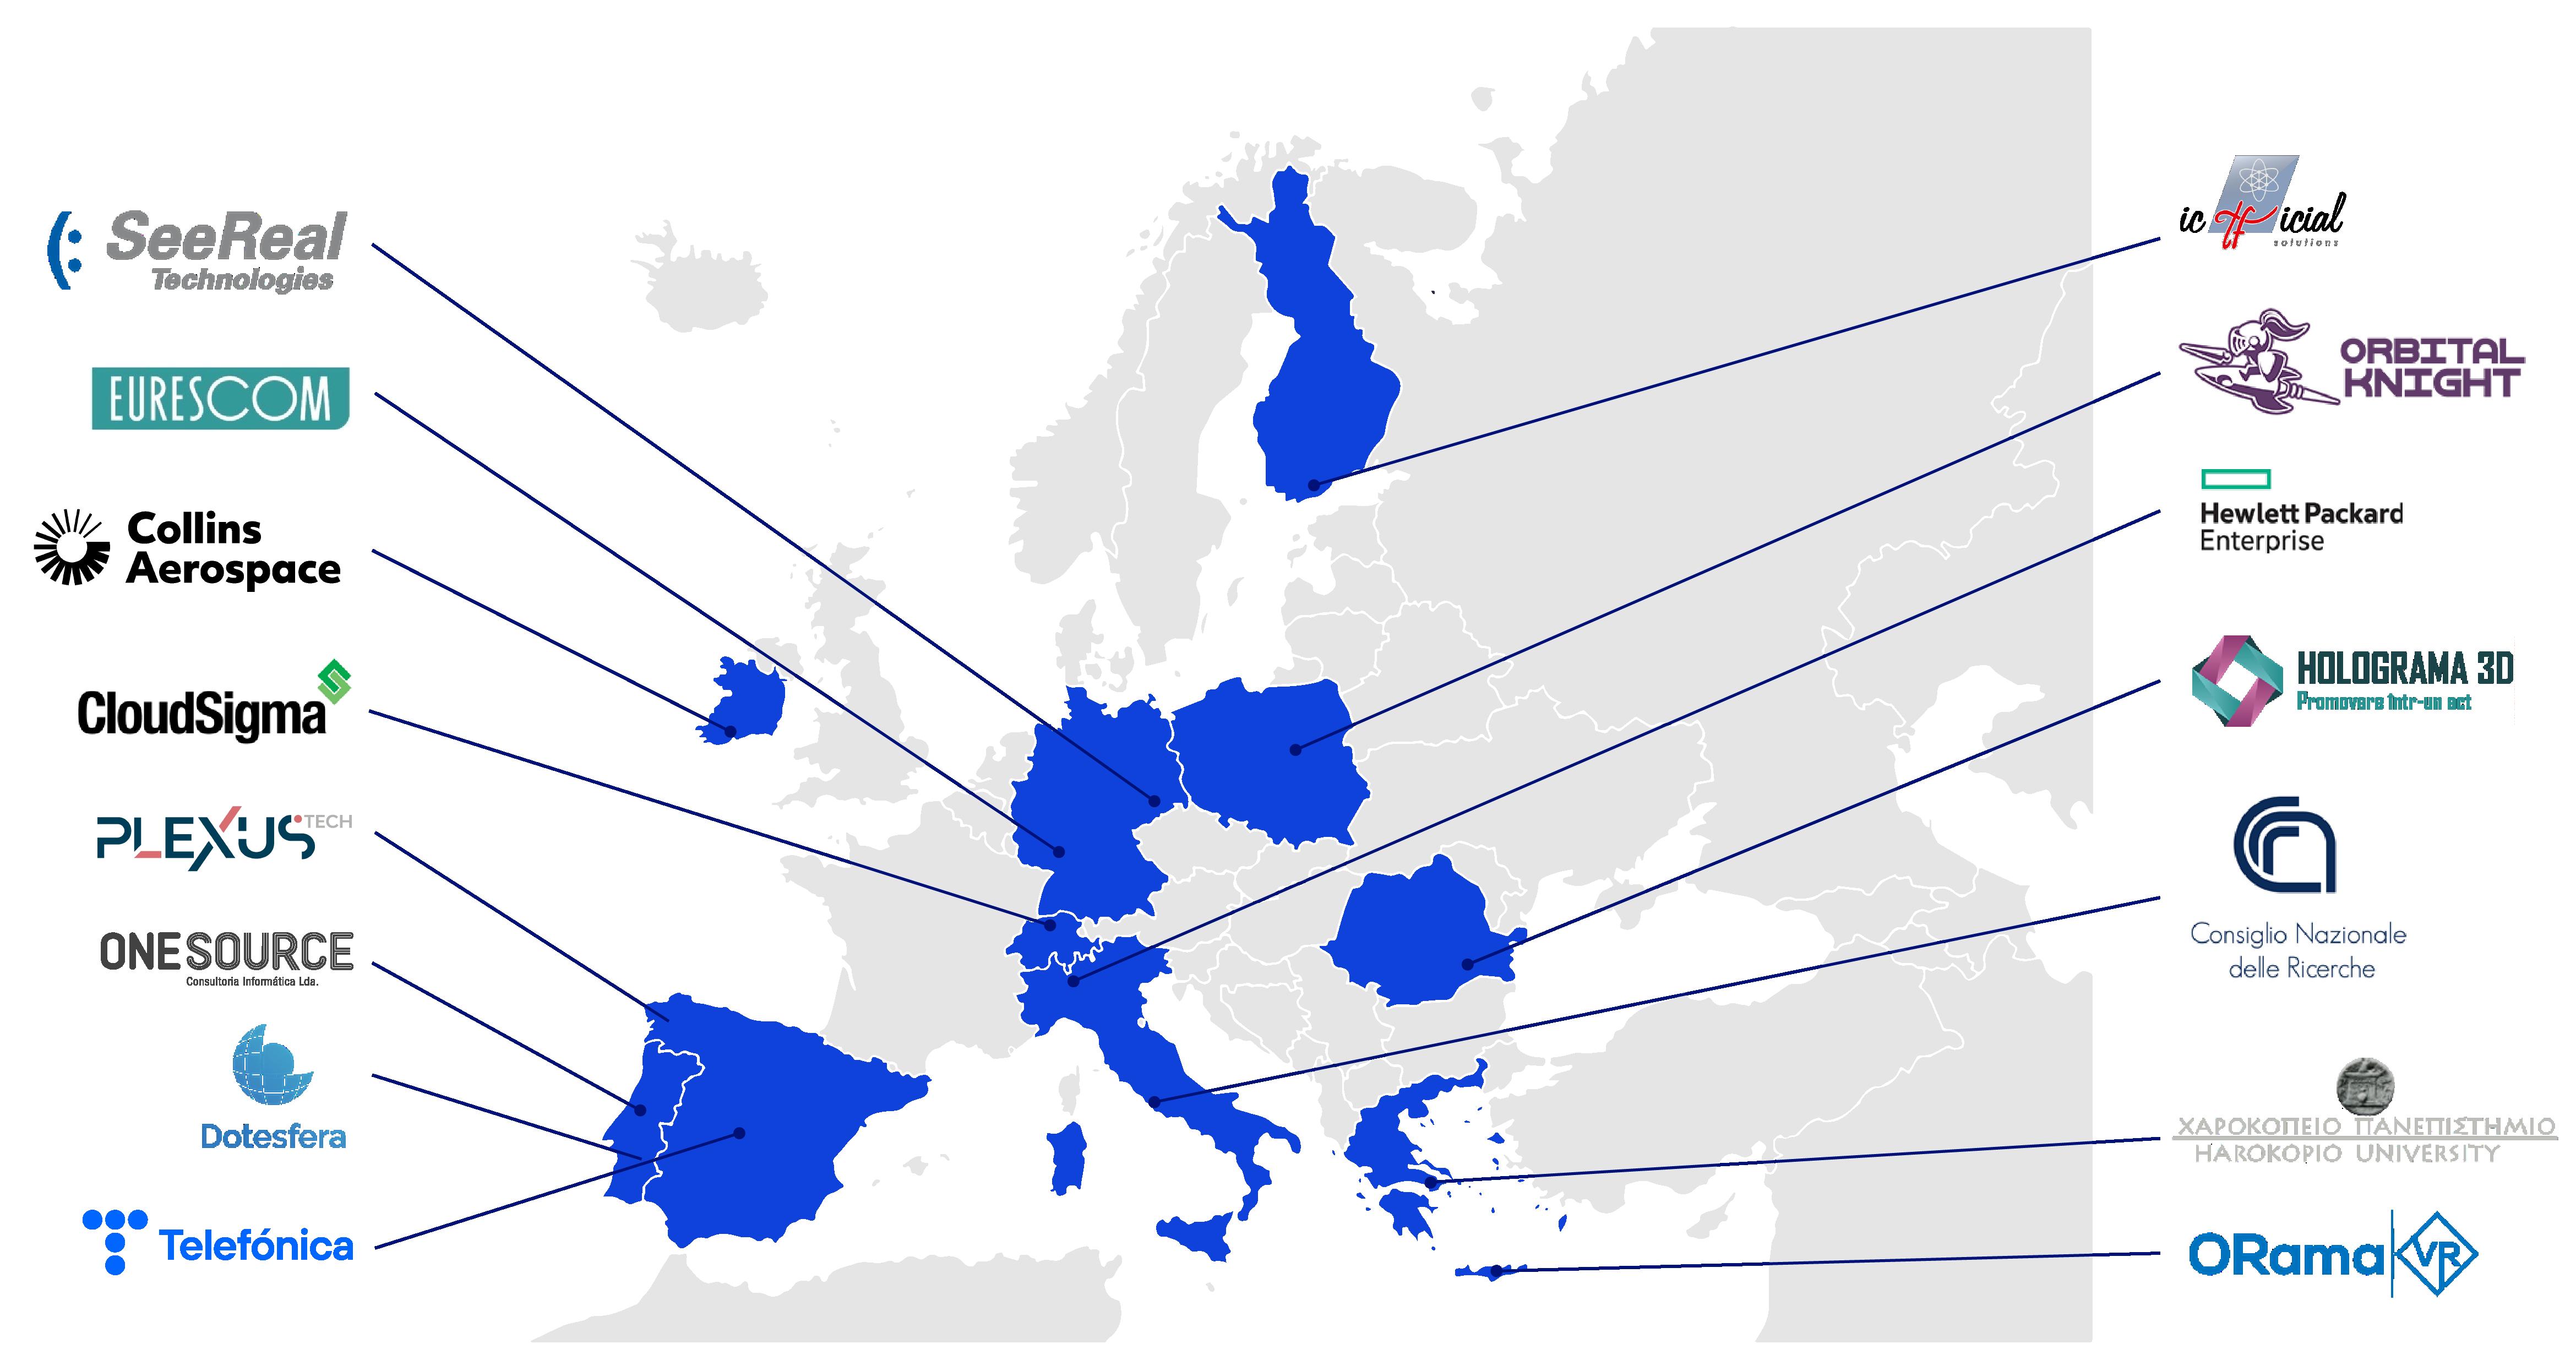 CHARITY consortium